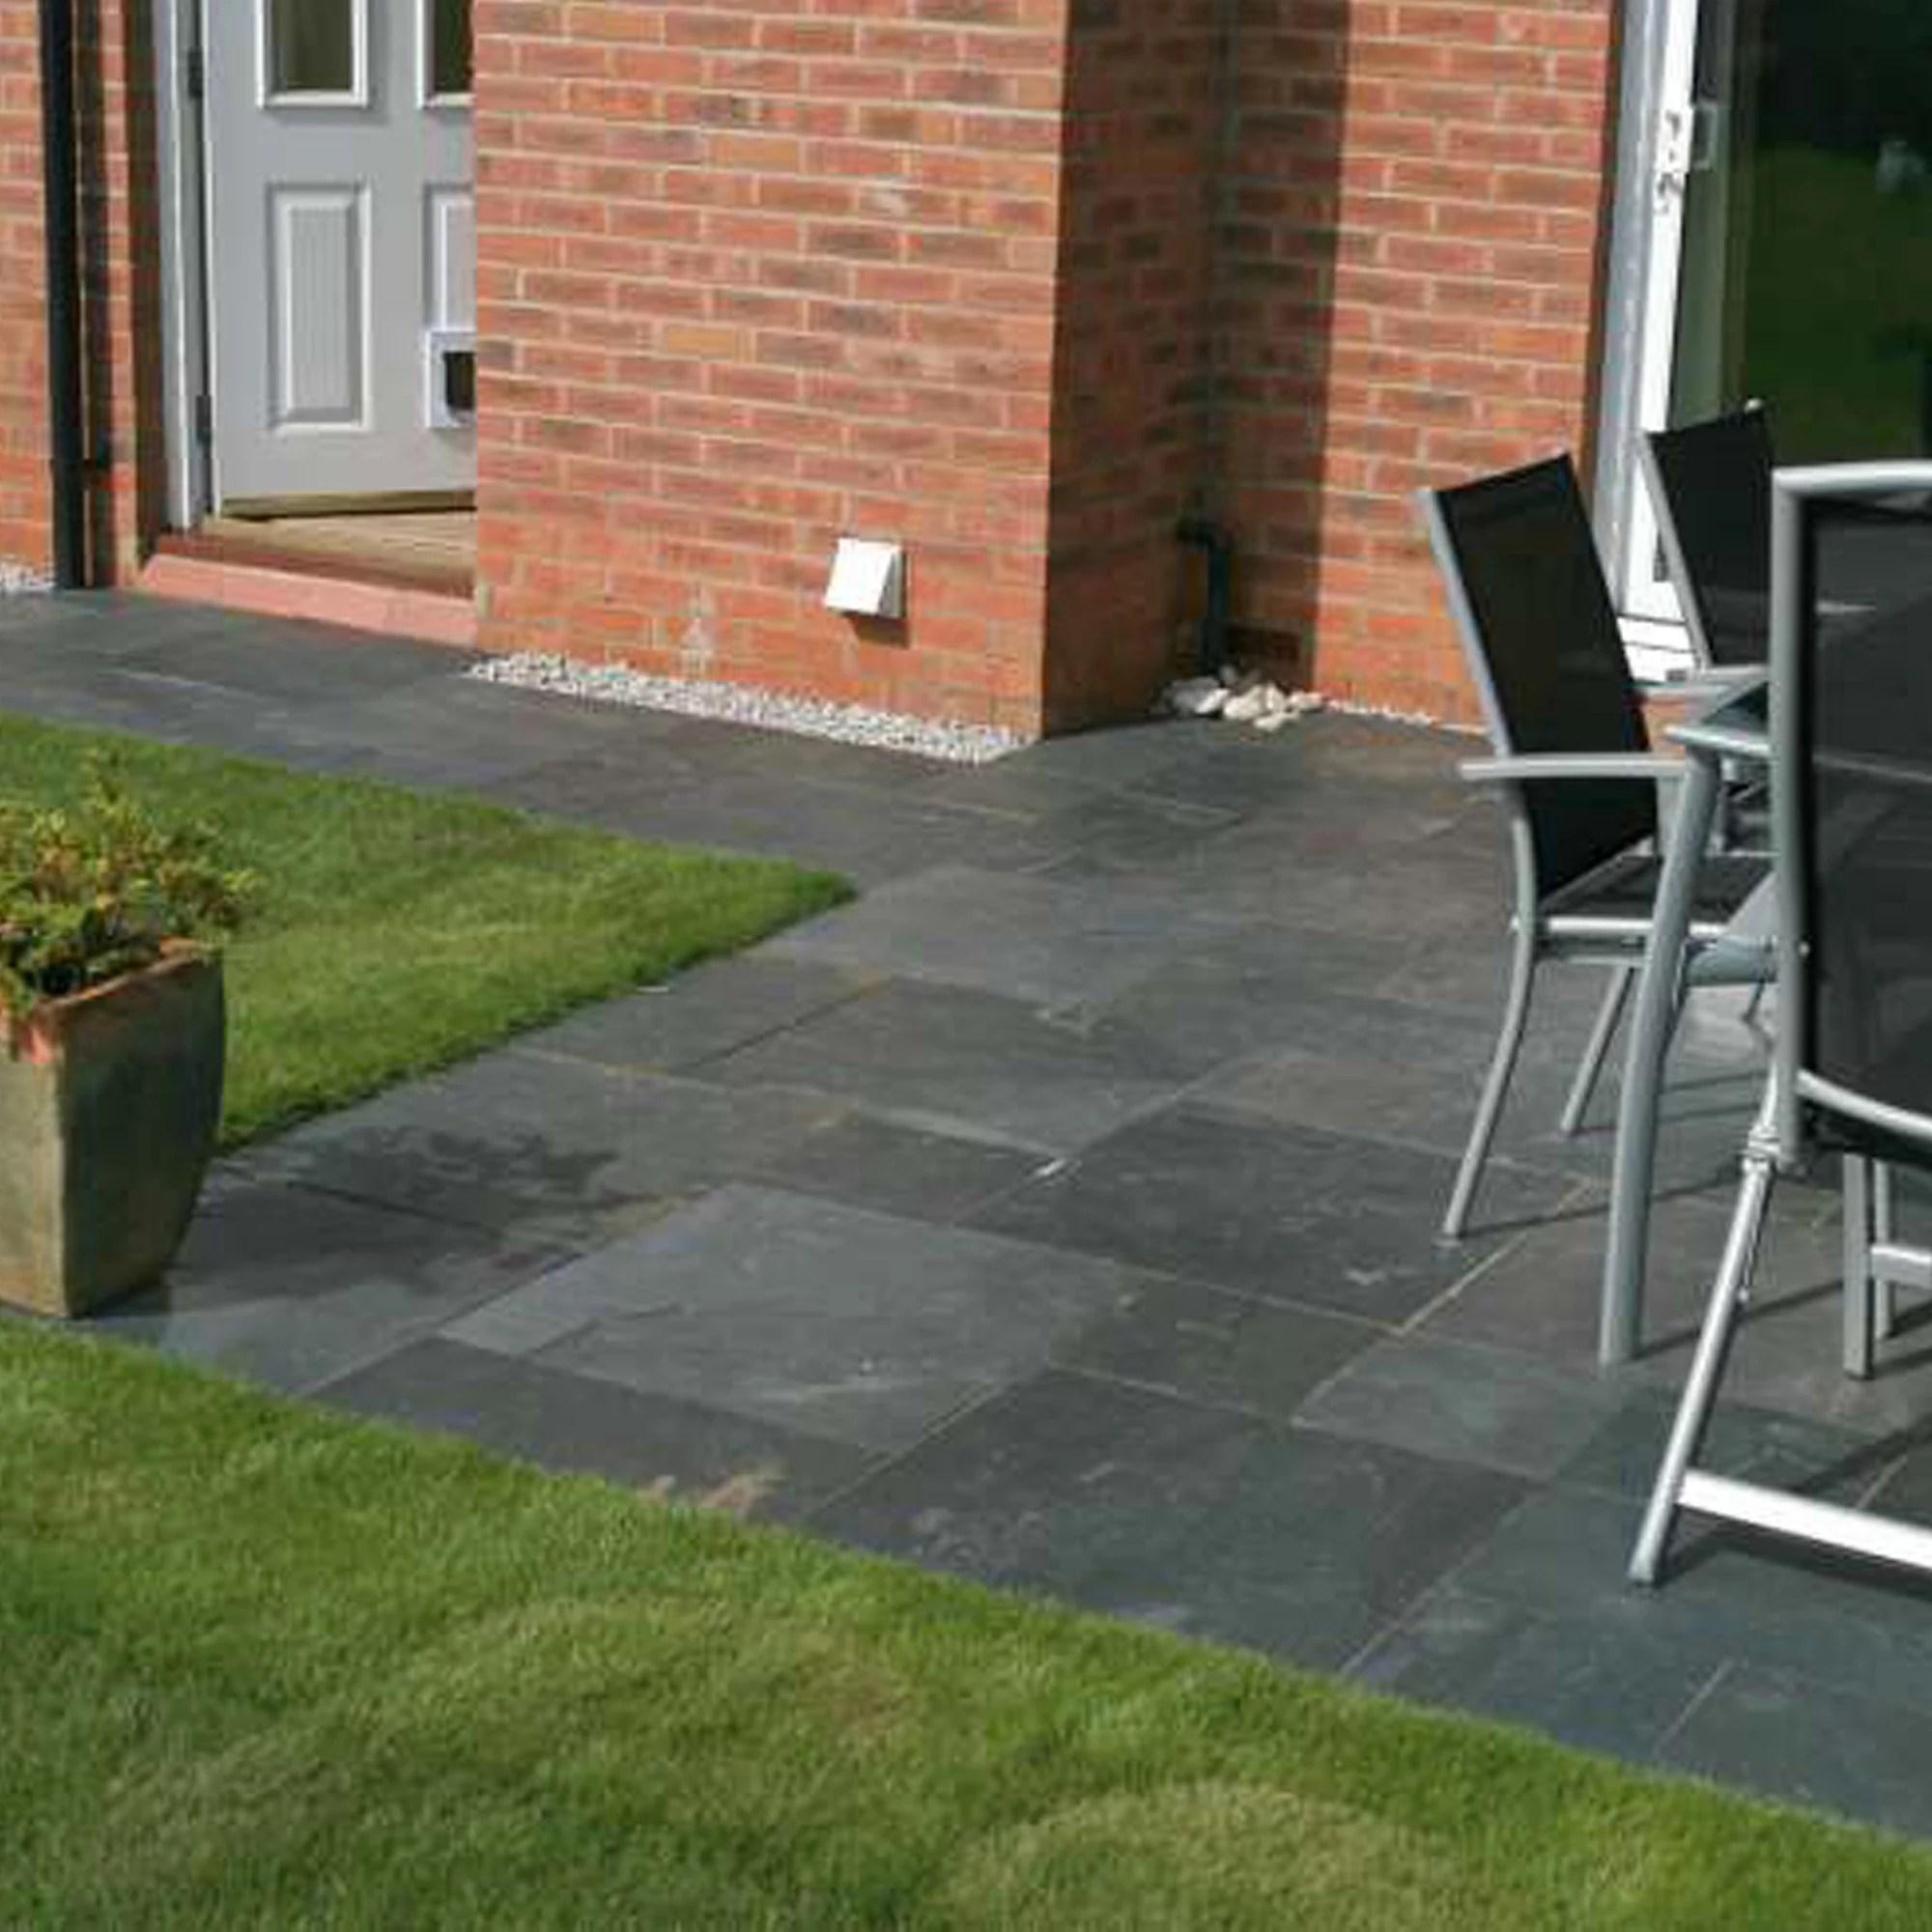 outdoor kitchen kit sink faucets slate grey natural paving | departments diy at b&q